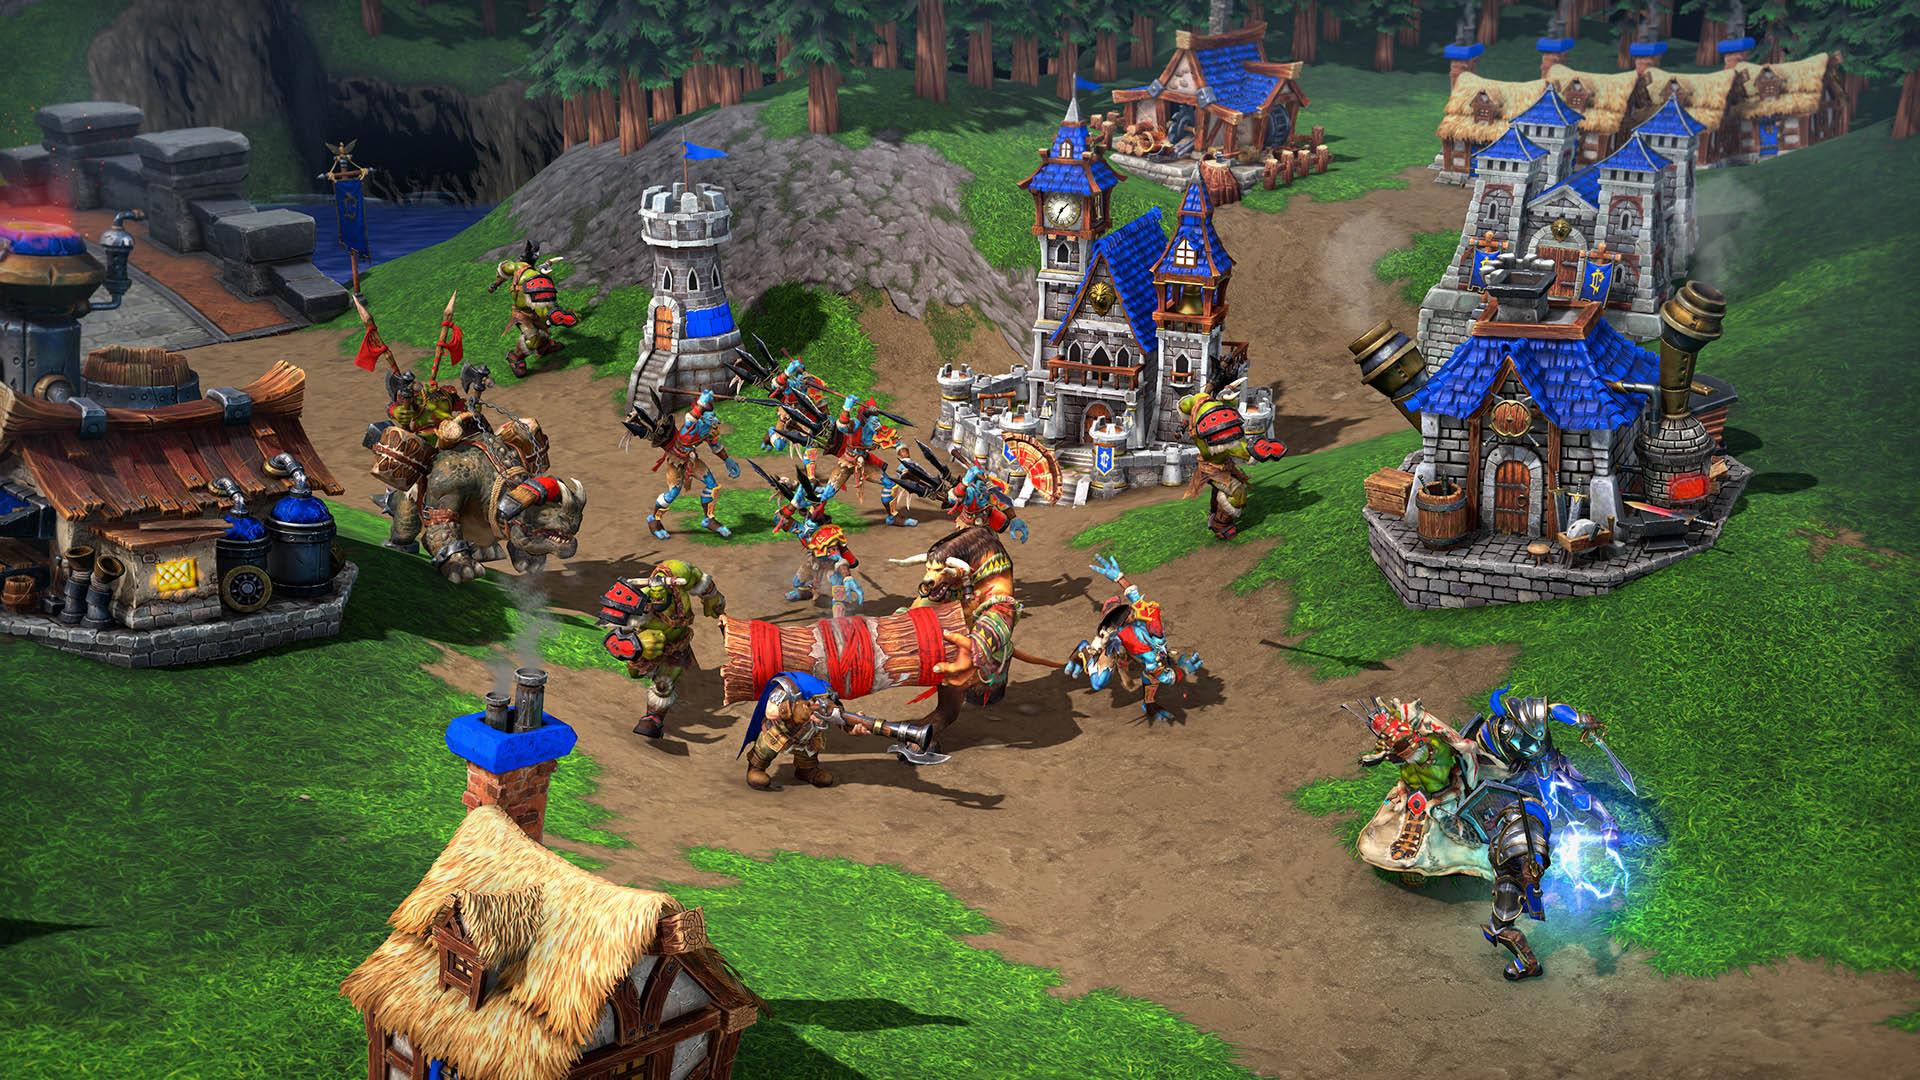 World of Warcraft III - Reforged